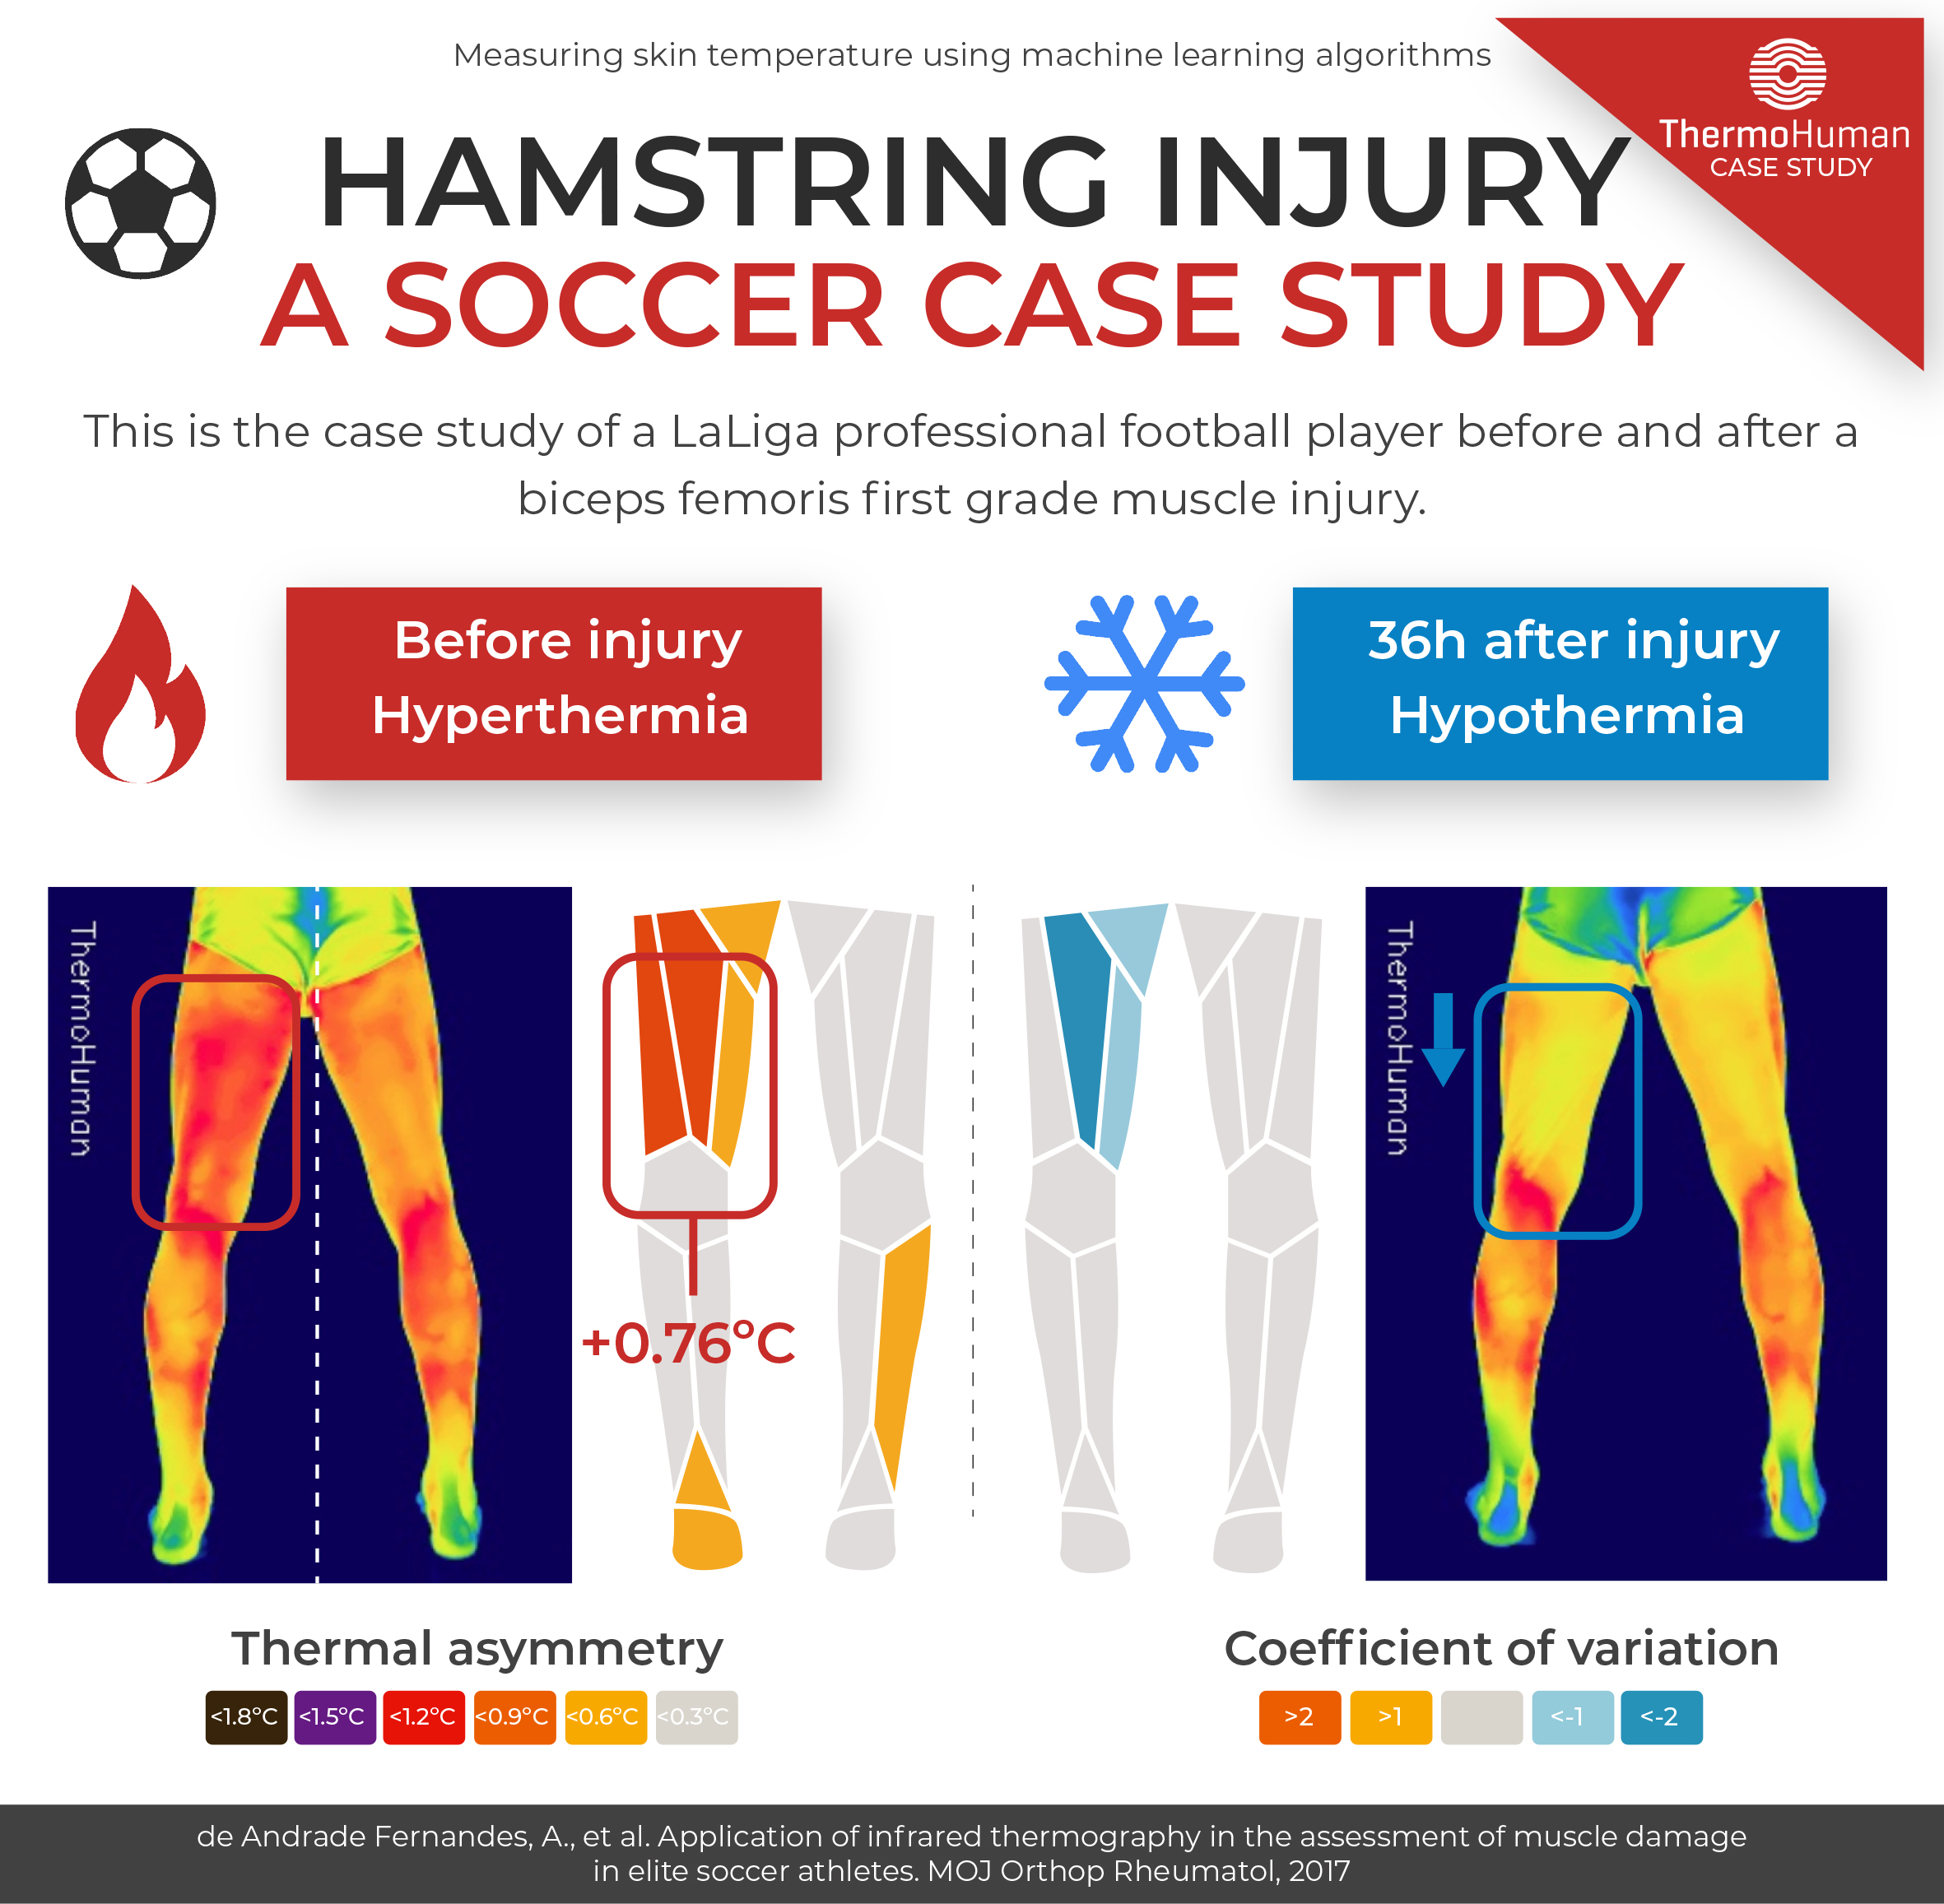 Hamstring injury: a soccer case study